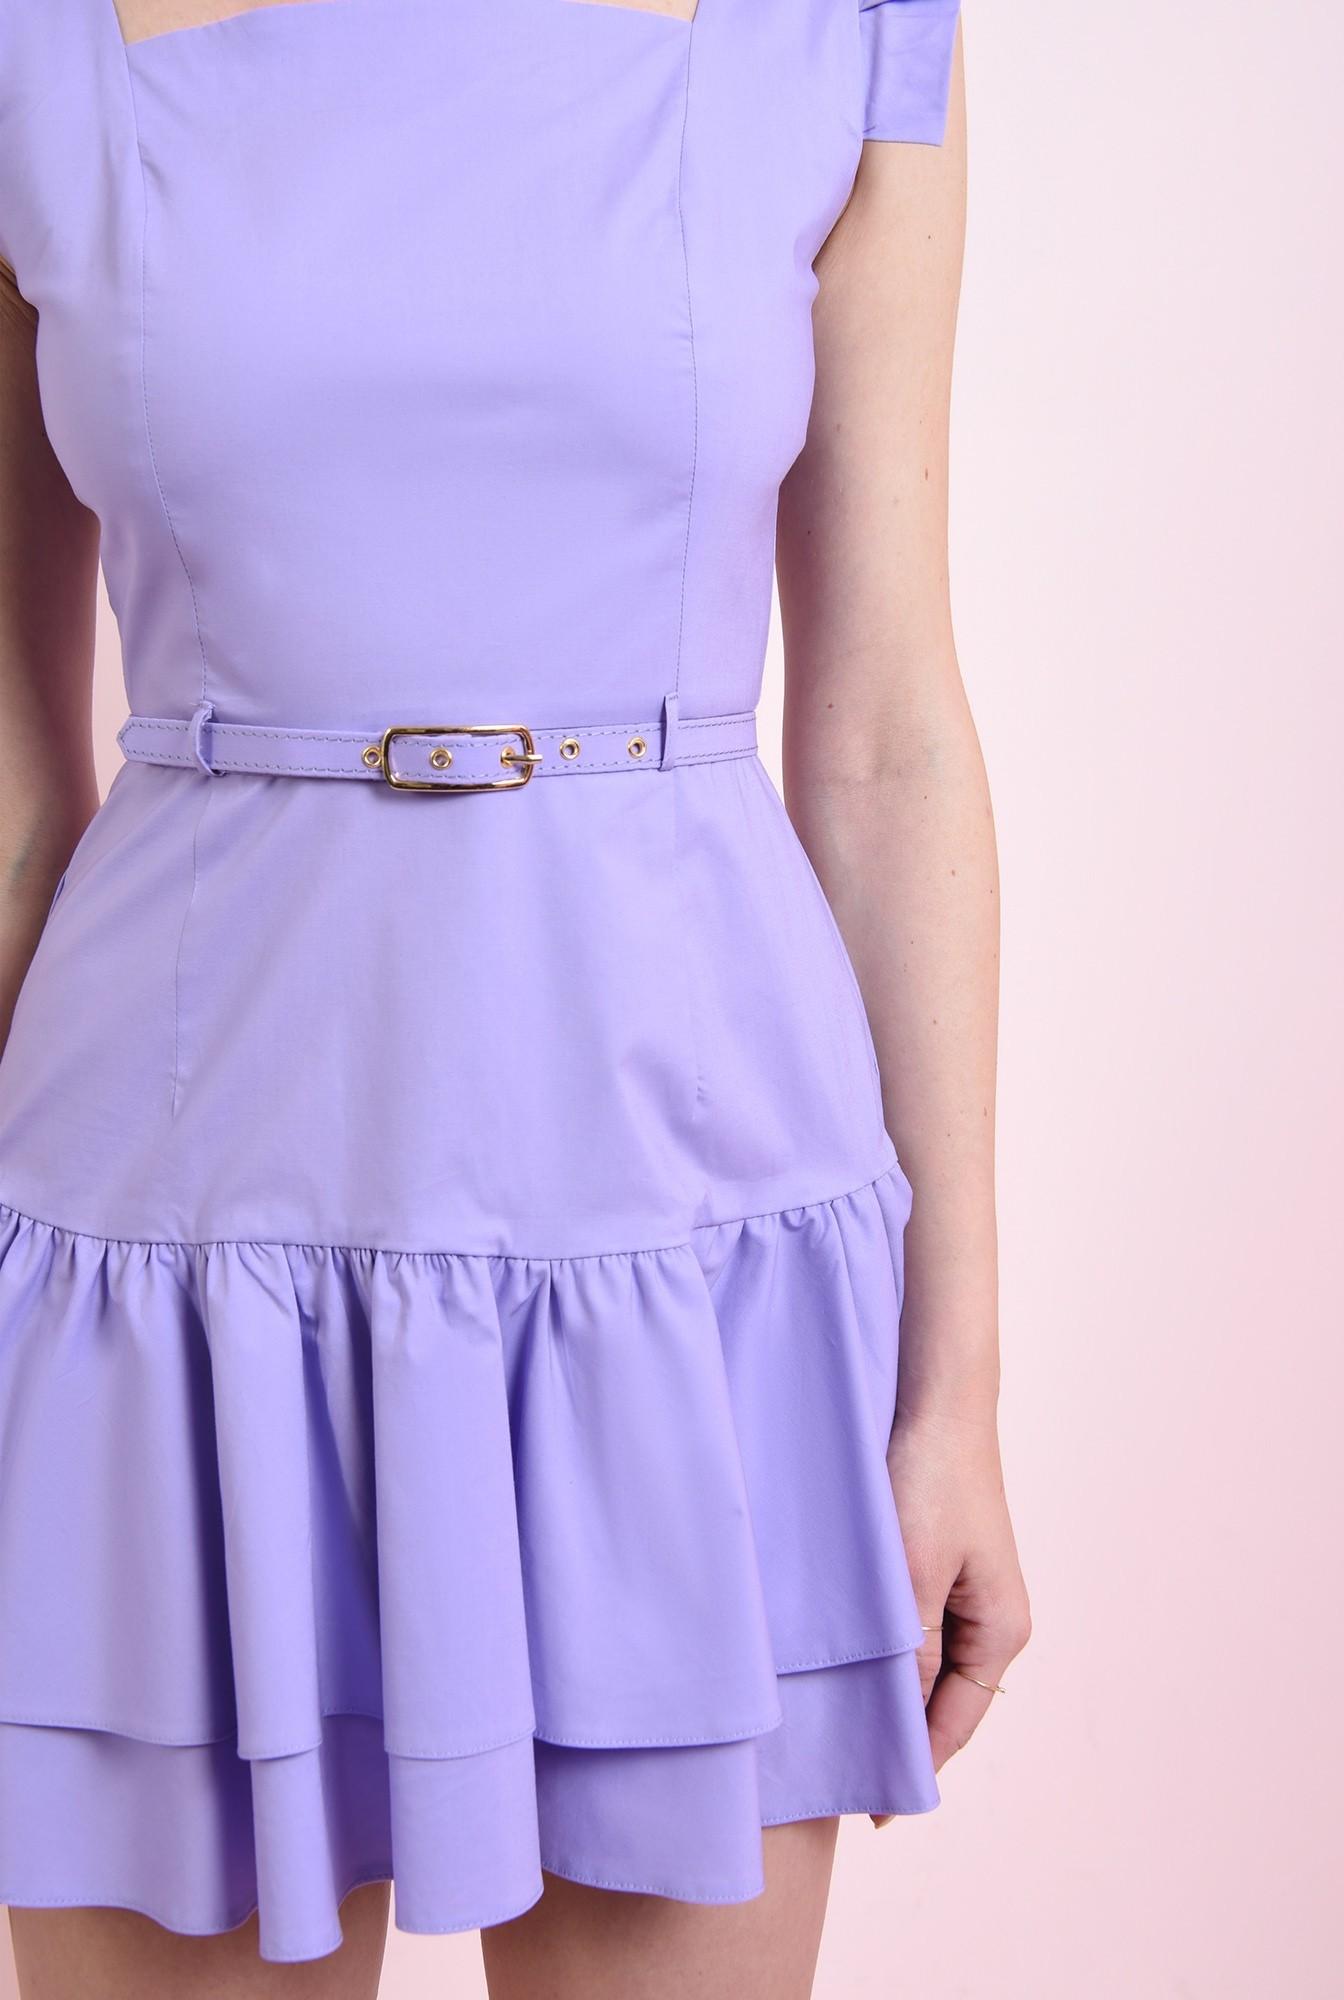 2 - rochie scurta, lila, tip sarafan